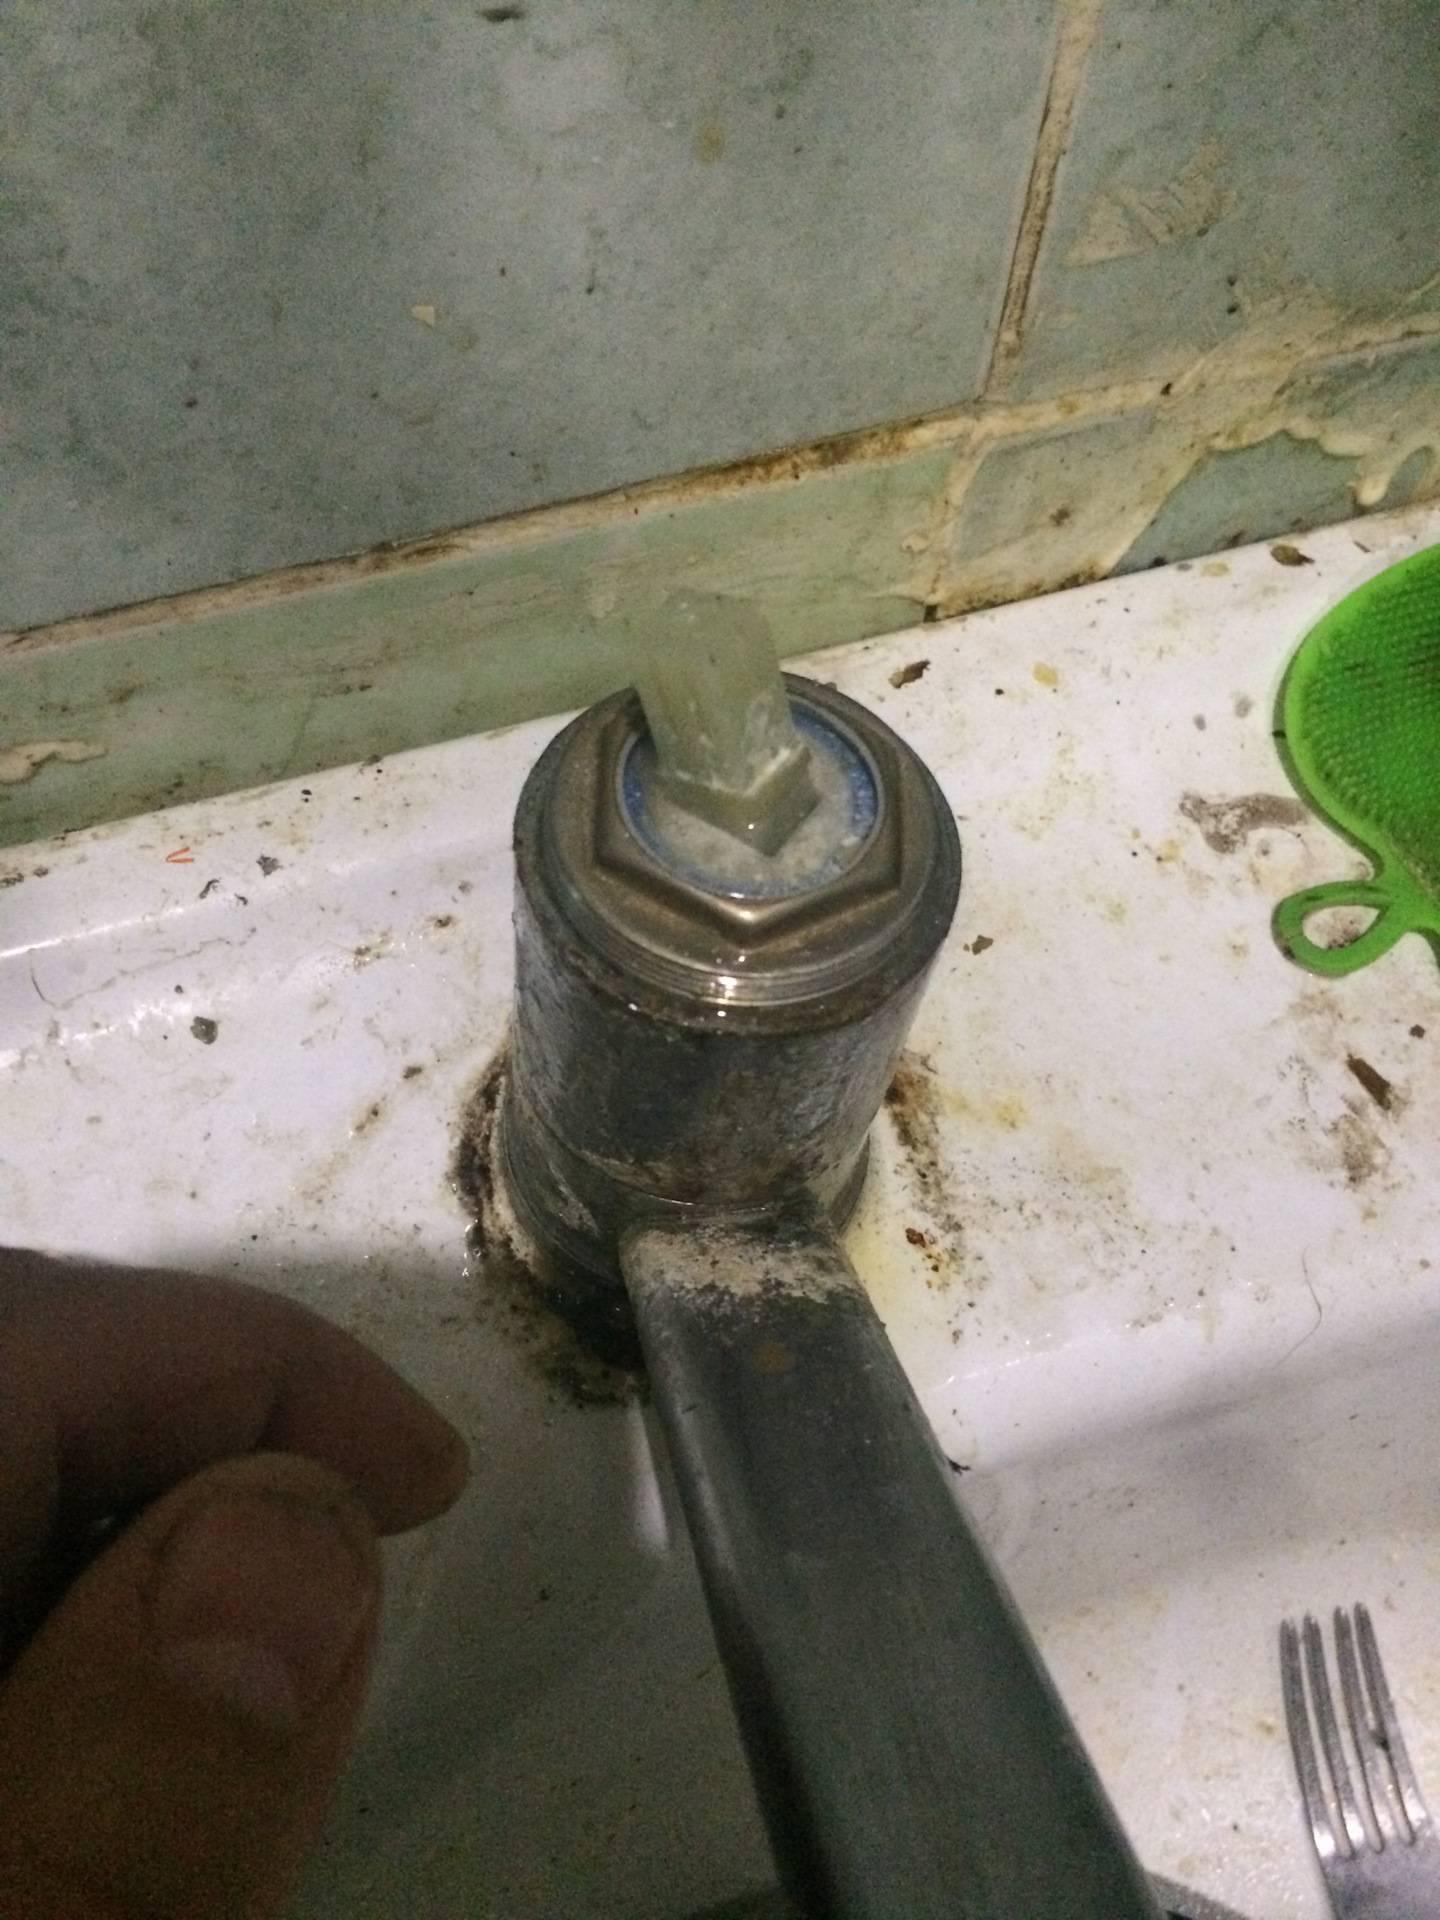 Замена картриджа в смесителе: ремонт своими руками